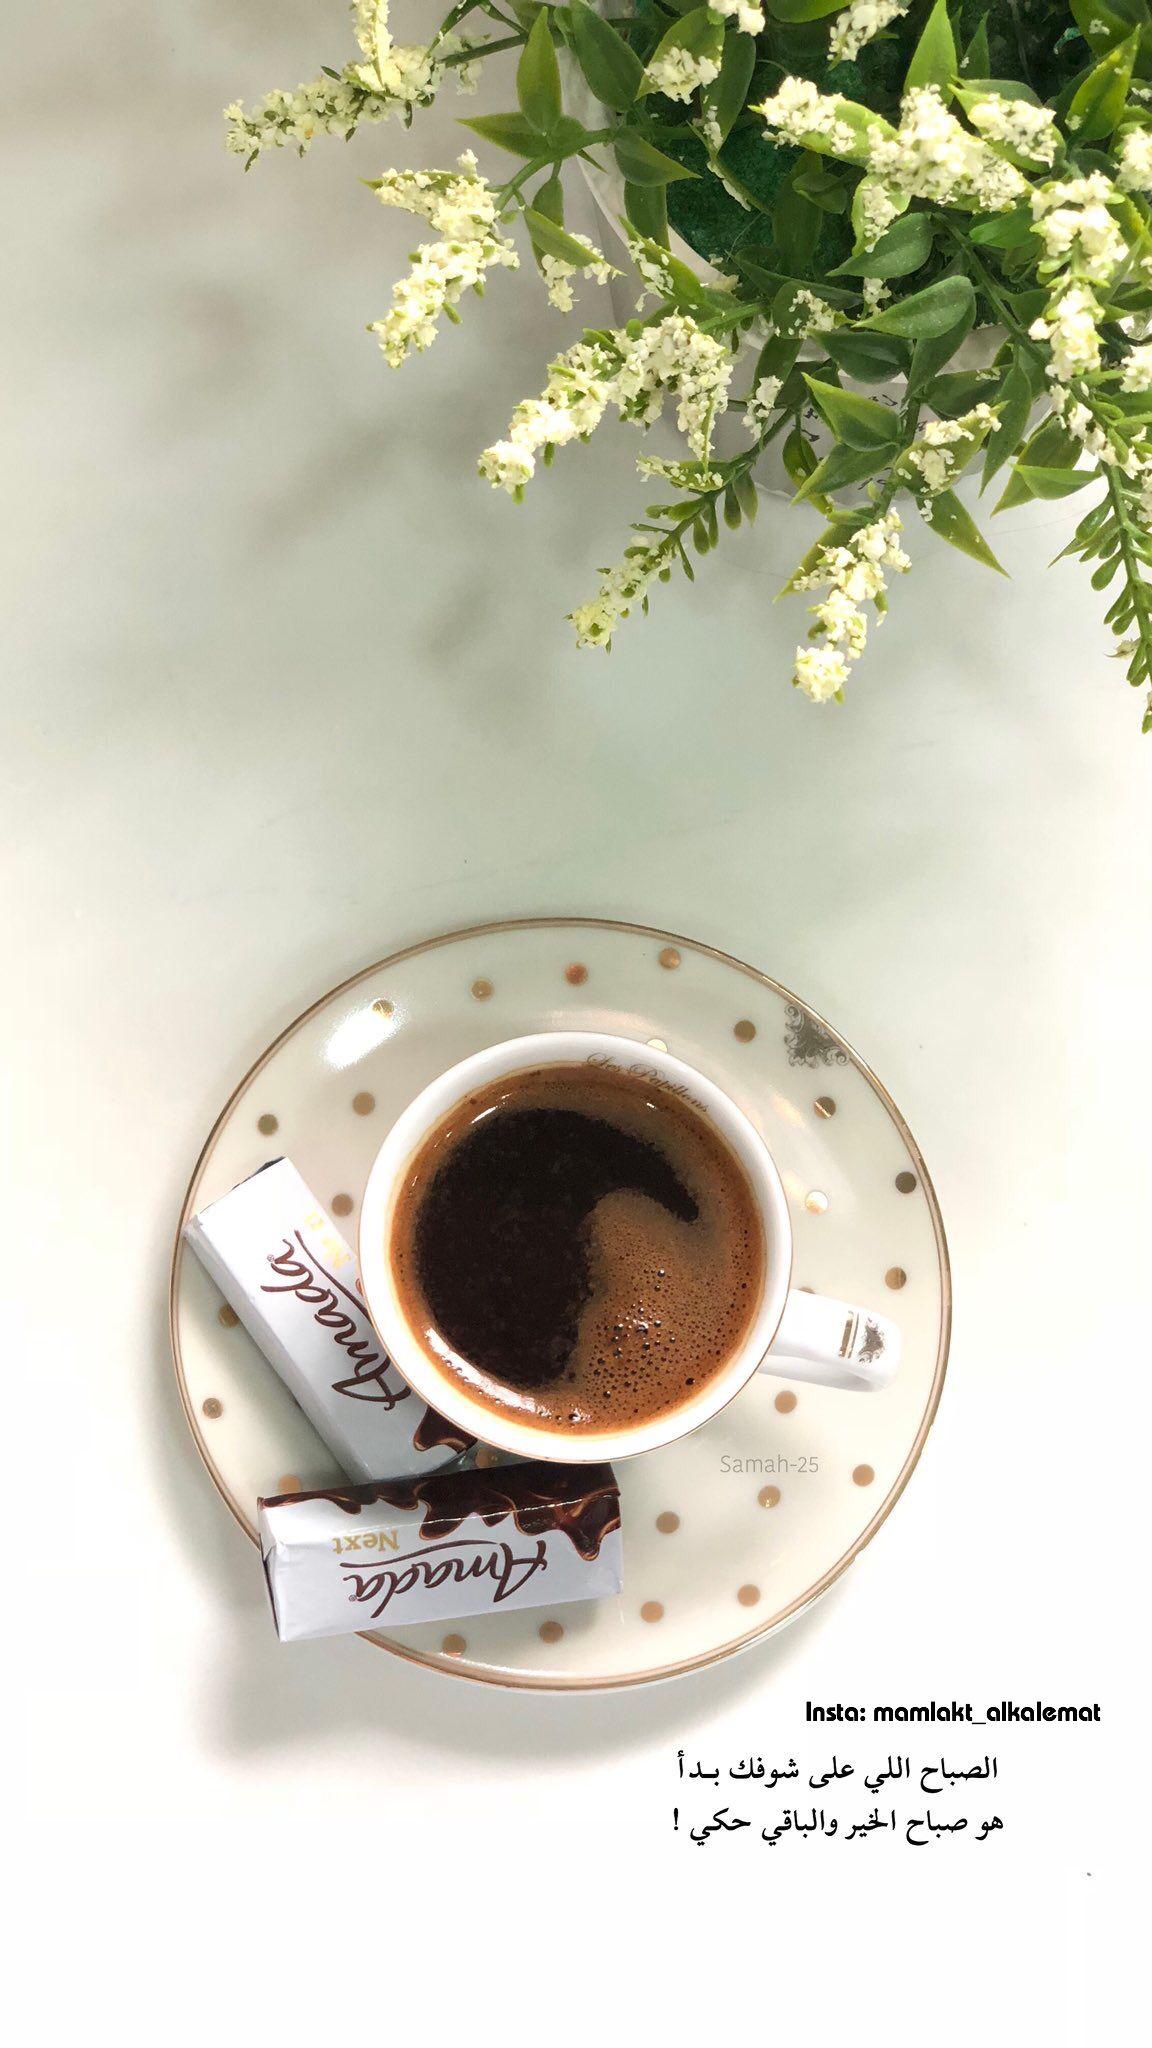 Pin By Fashion On Coffee Lover Coffee Photography Chocolate Coffee Coffee Lover